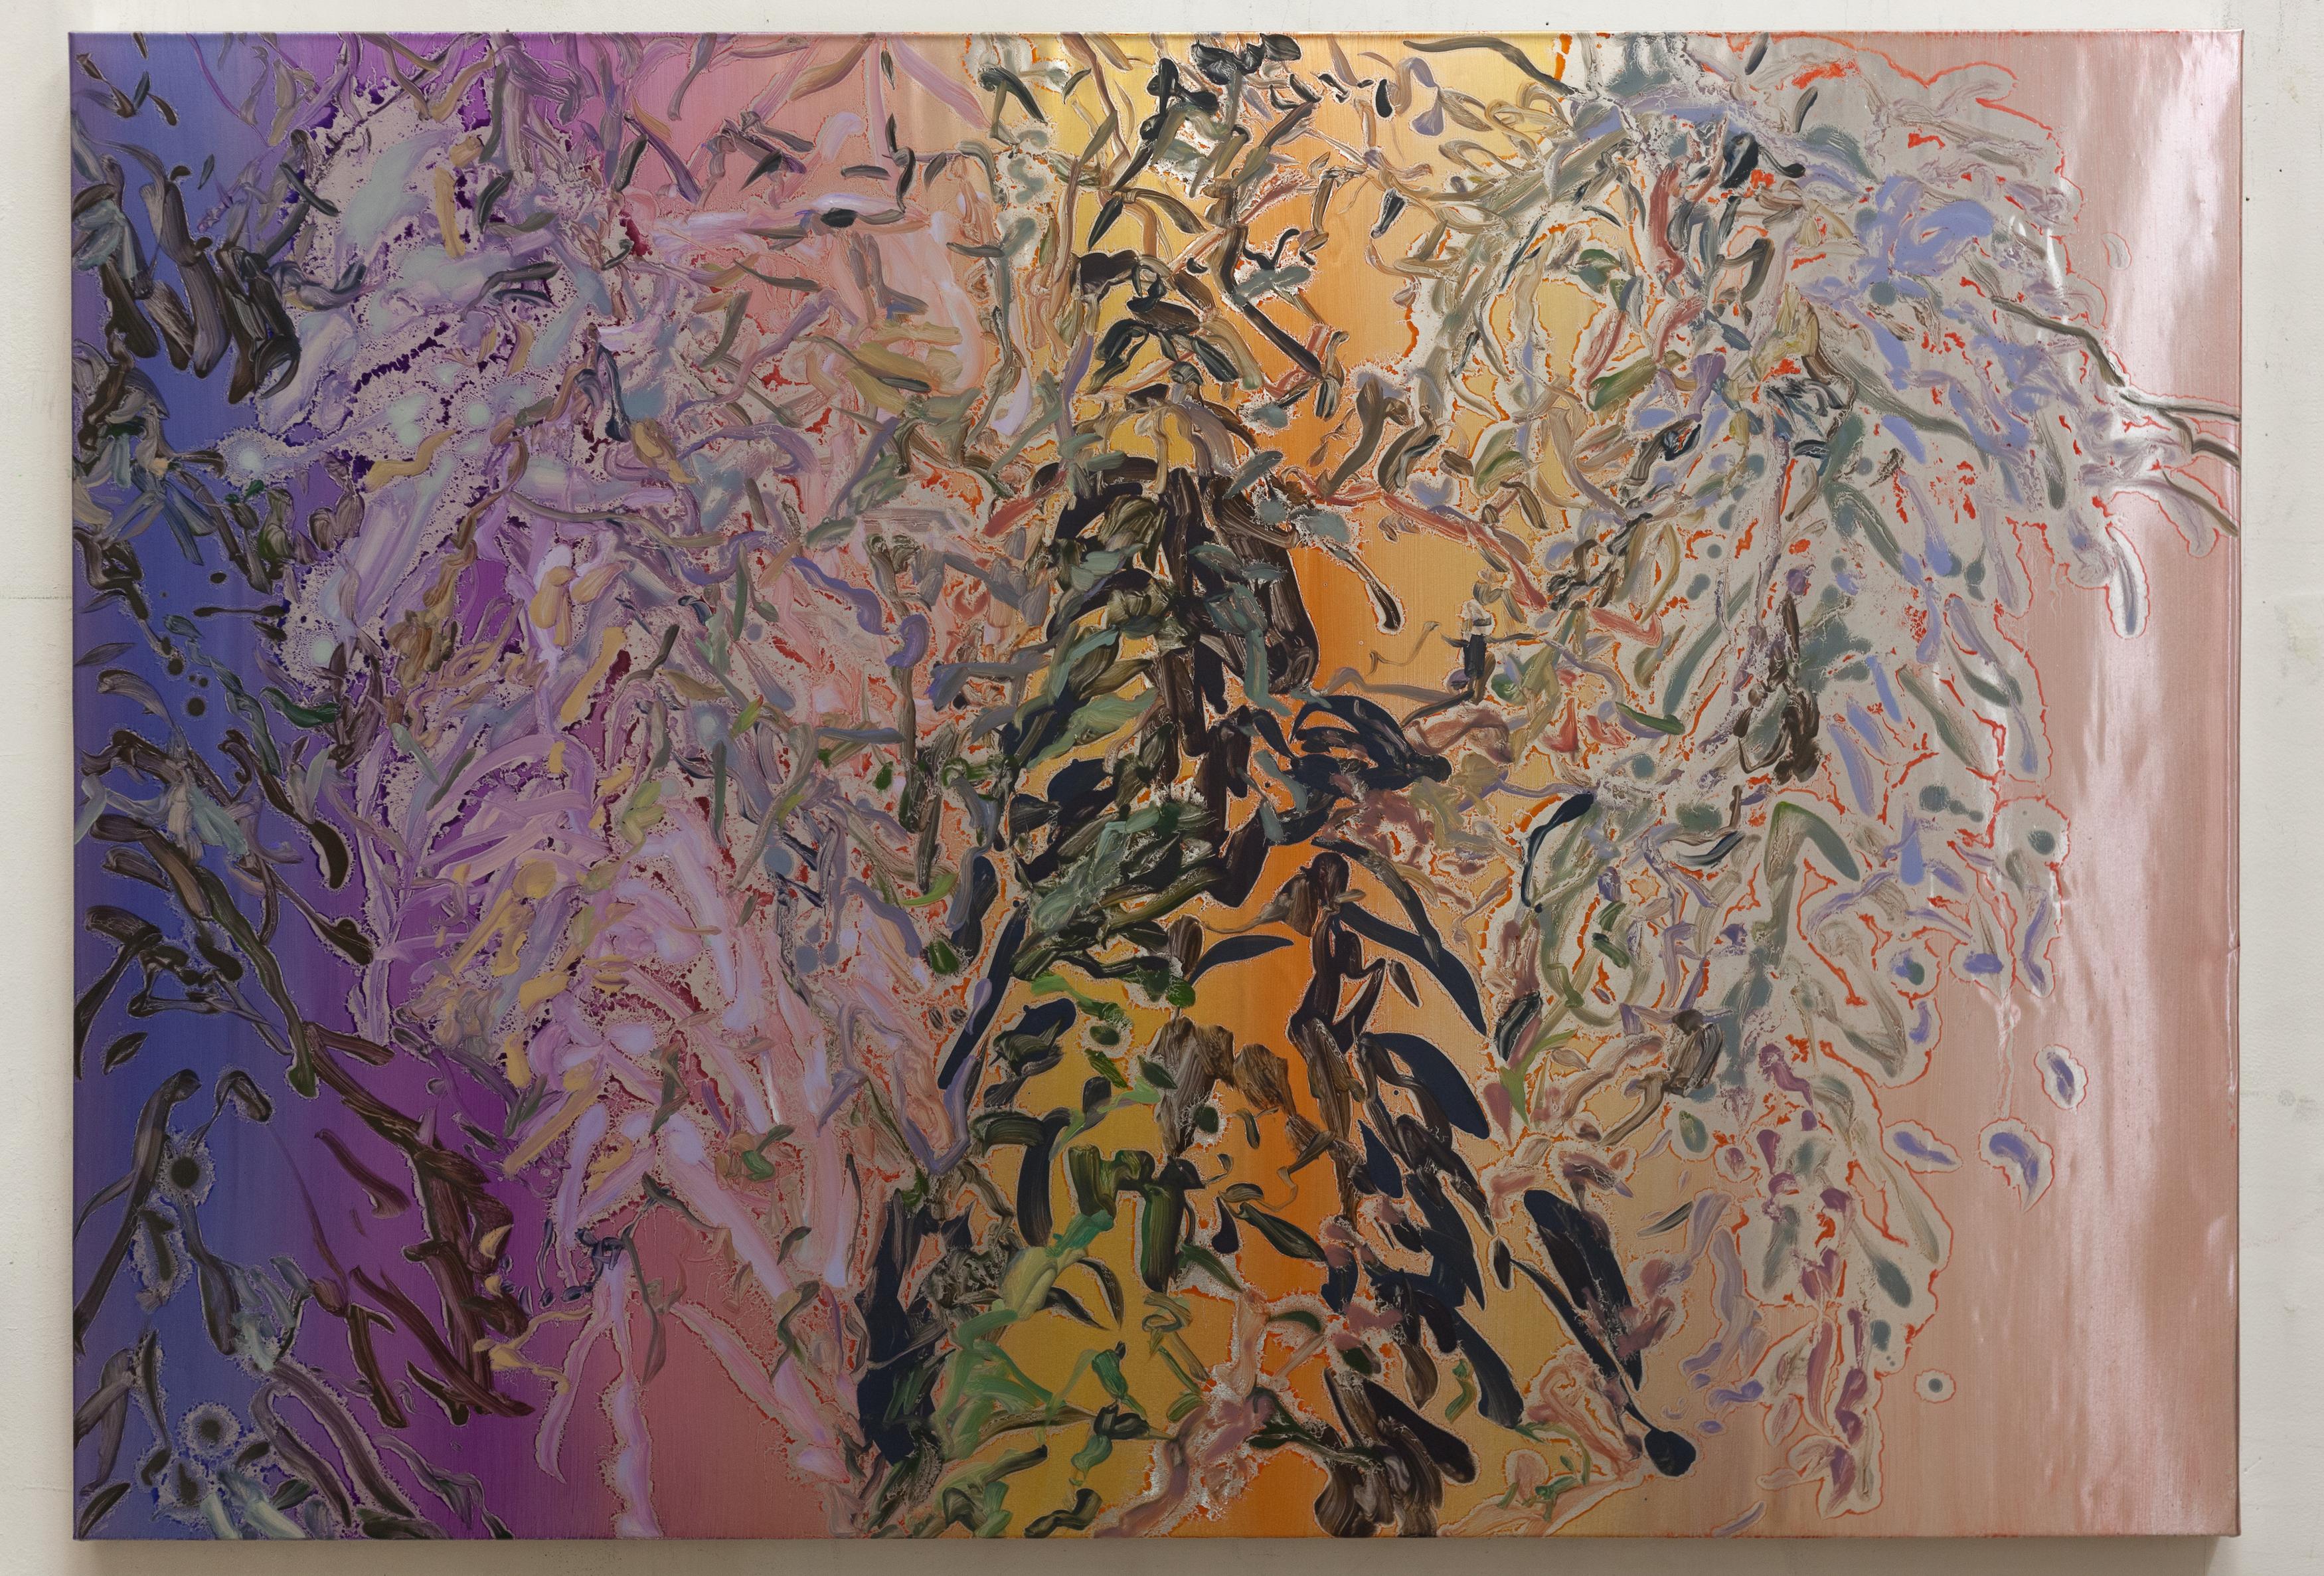 Henrik Eriksson, Utan titel (dhs 04), 2018 Oil on aluminium, 85 x 122 cm